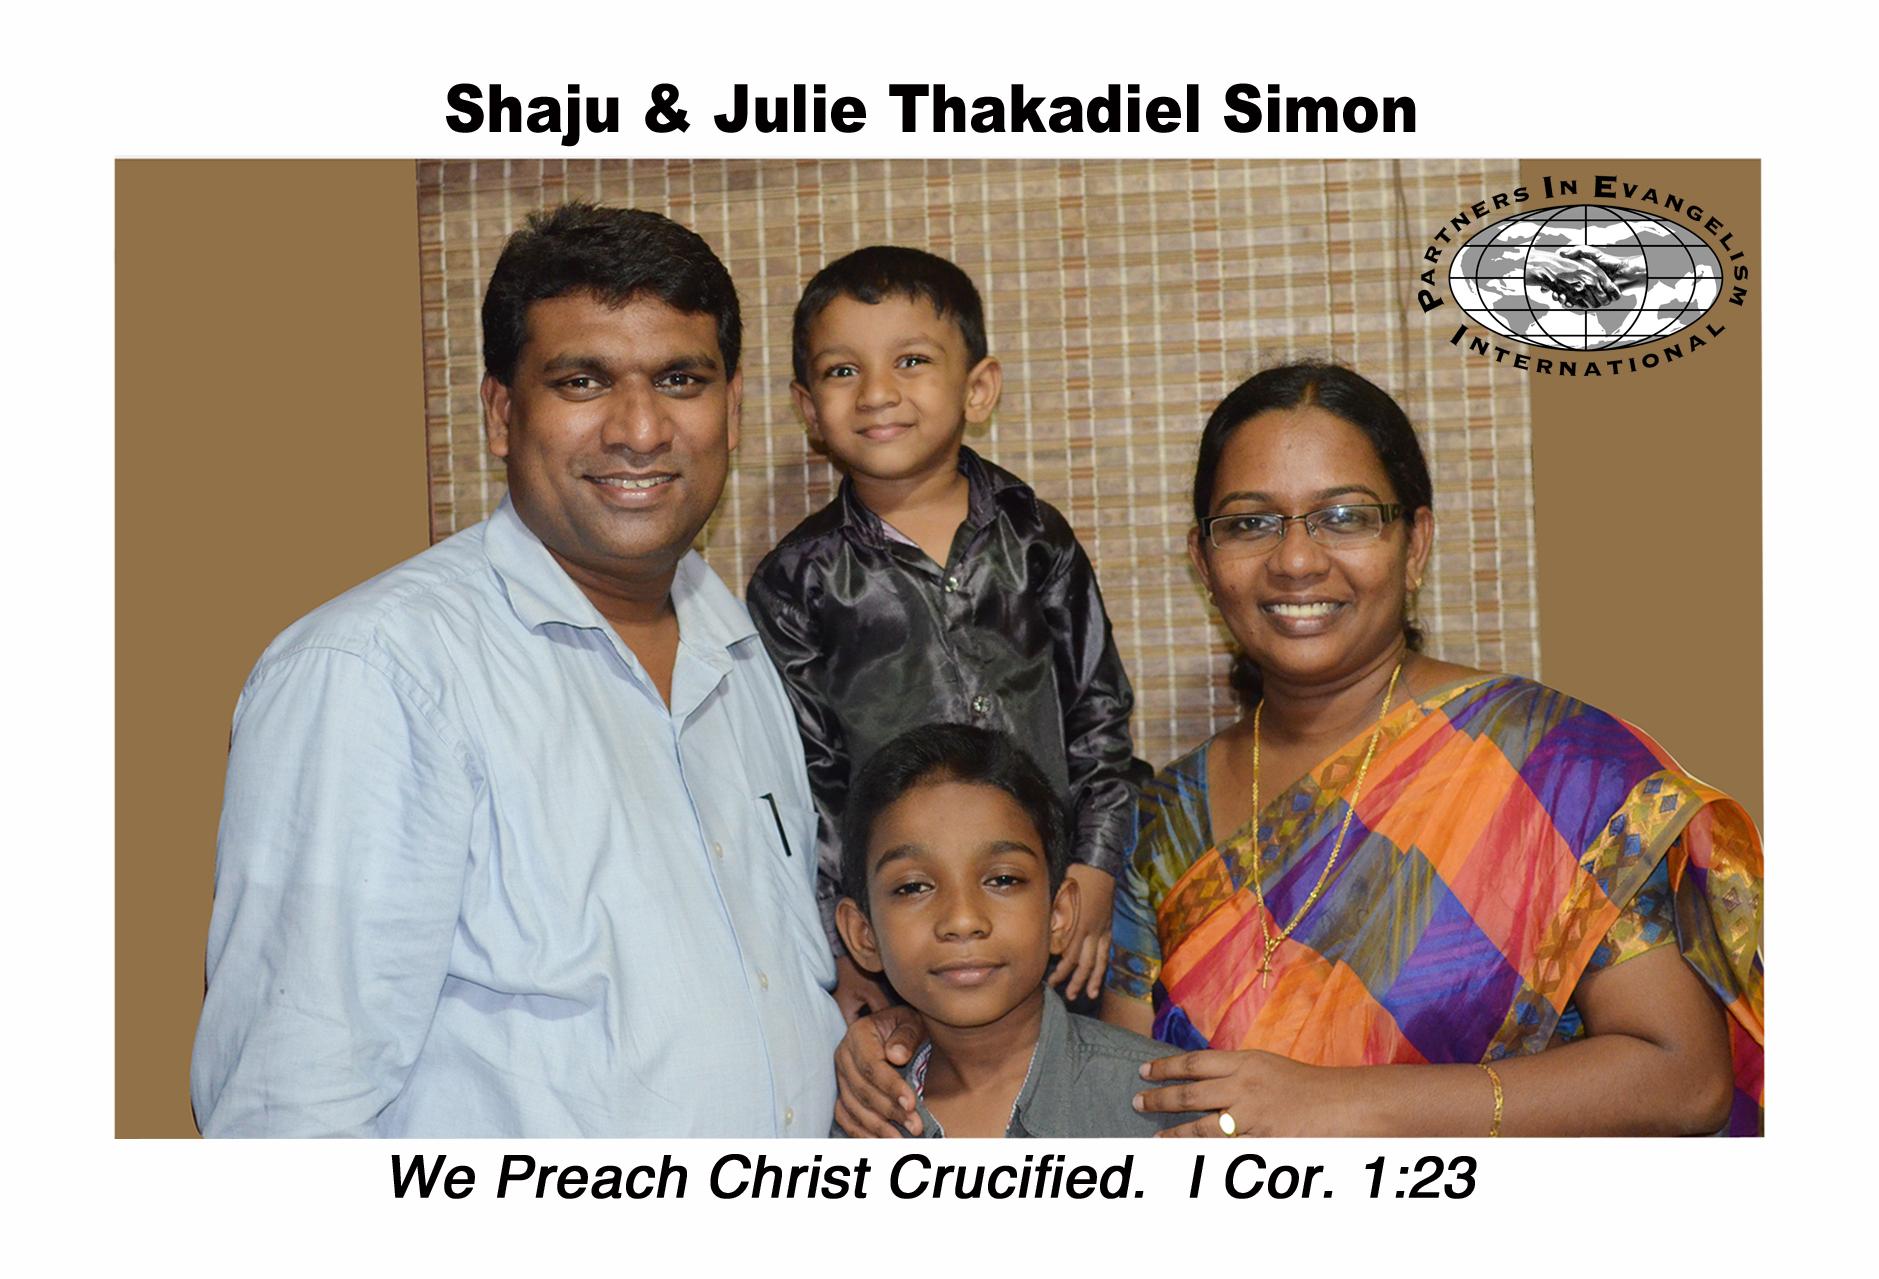 Mission Update – Rev. Shaju Simon – Partners in Evangelism International